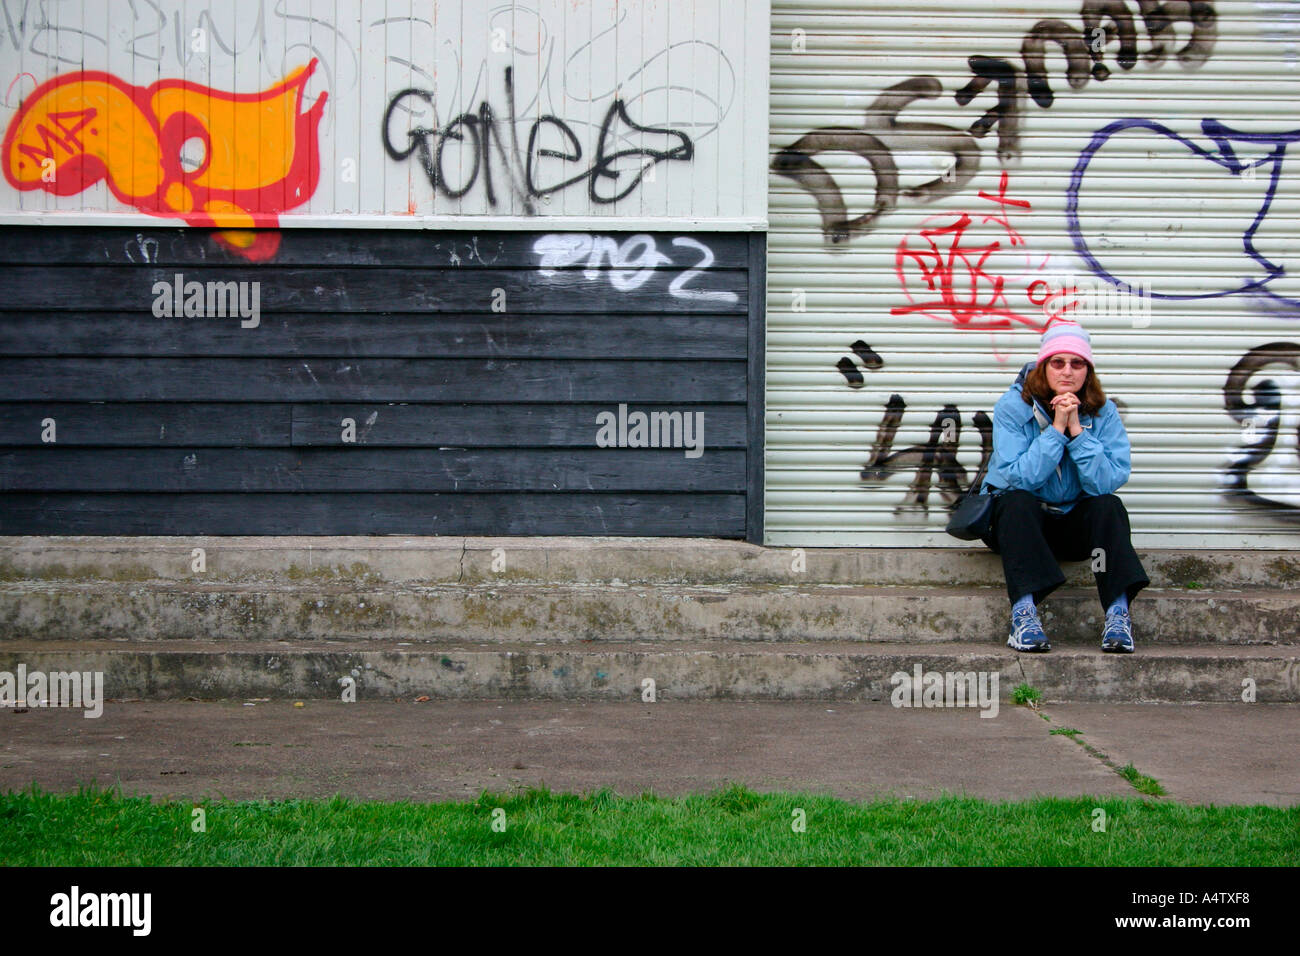 Graffiti wall cambridge - Stock Photo Woman Sitting In Front Of Urban Graffiti Cambridge England